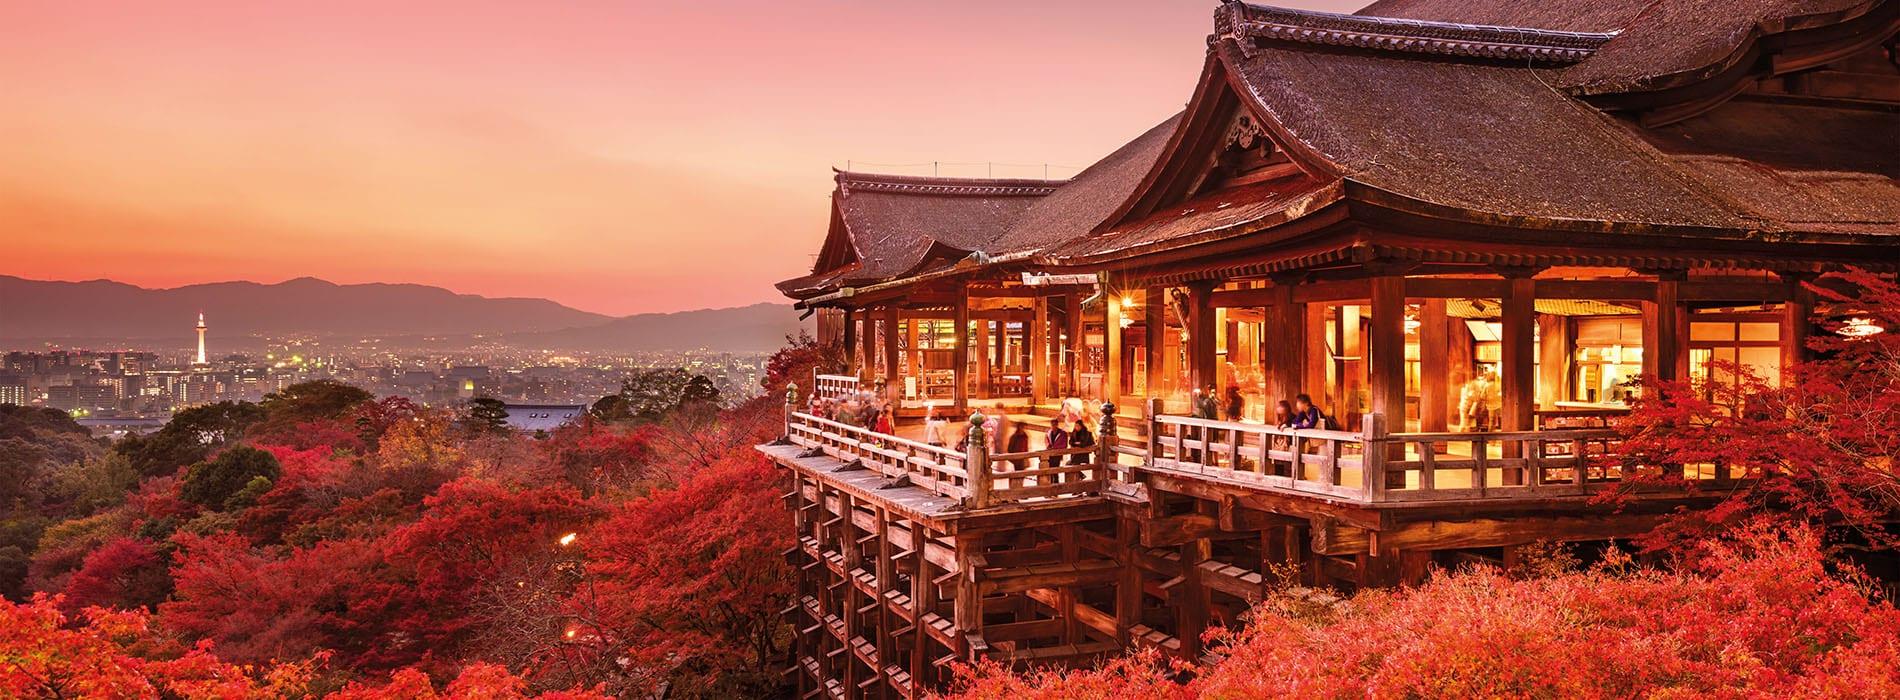 Kiyomizu Temple Kyoto